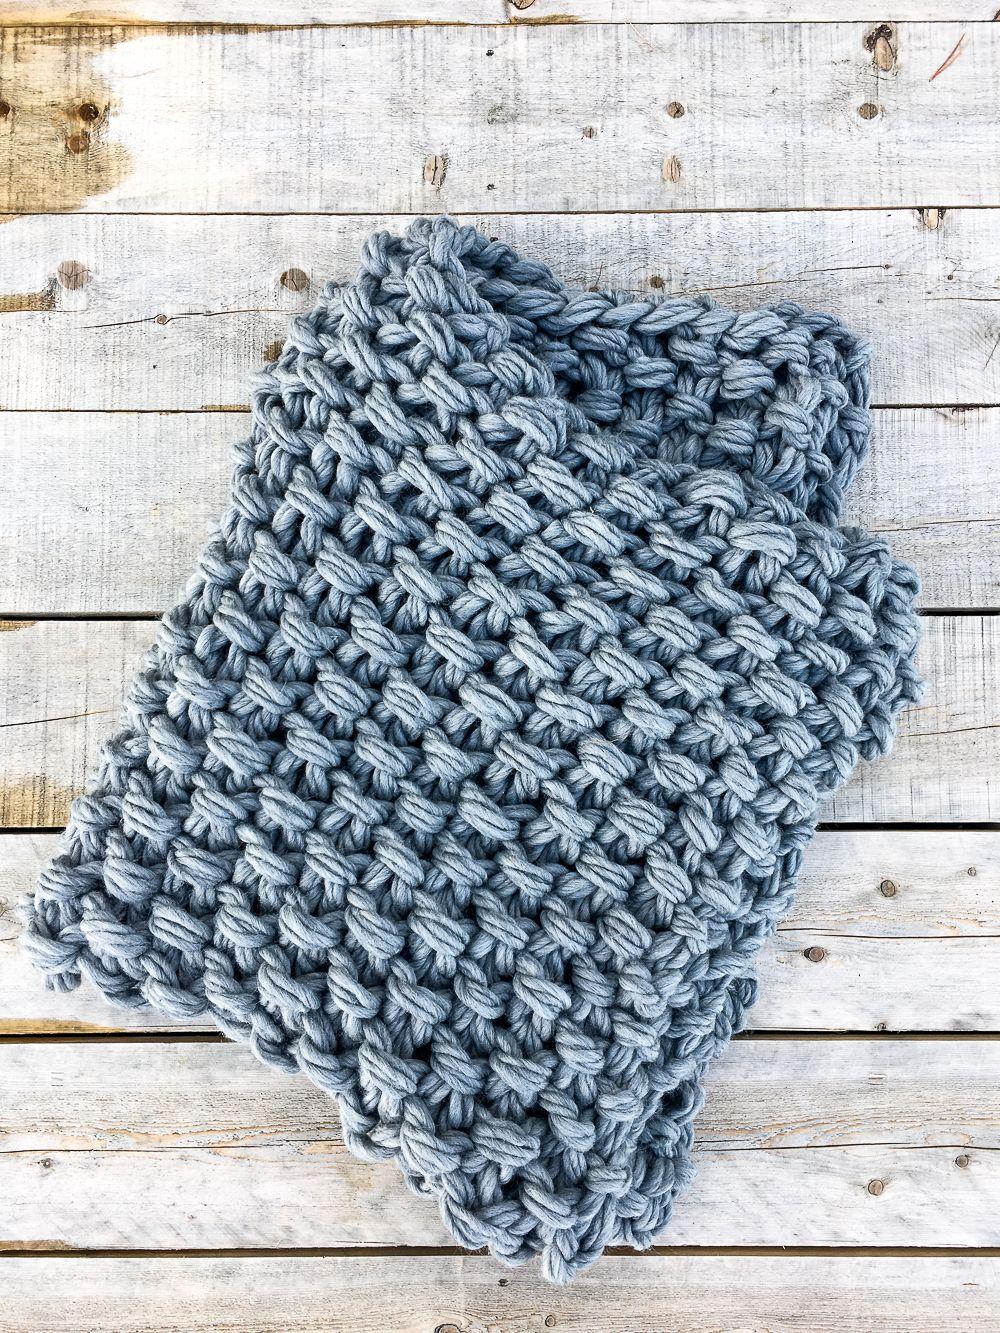 Arm Knit Seed Stitch Blanket Pattern | Arm knitting, Arm ...